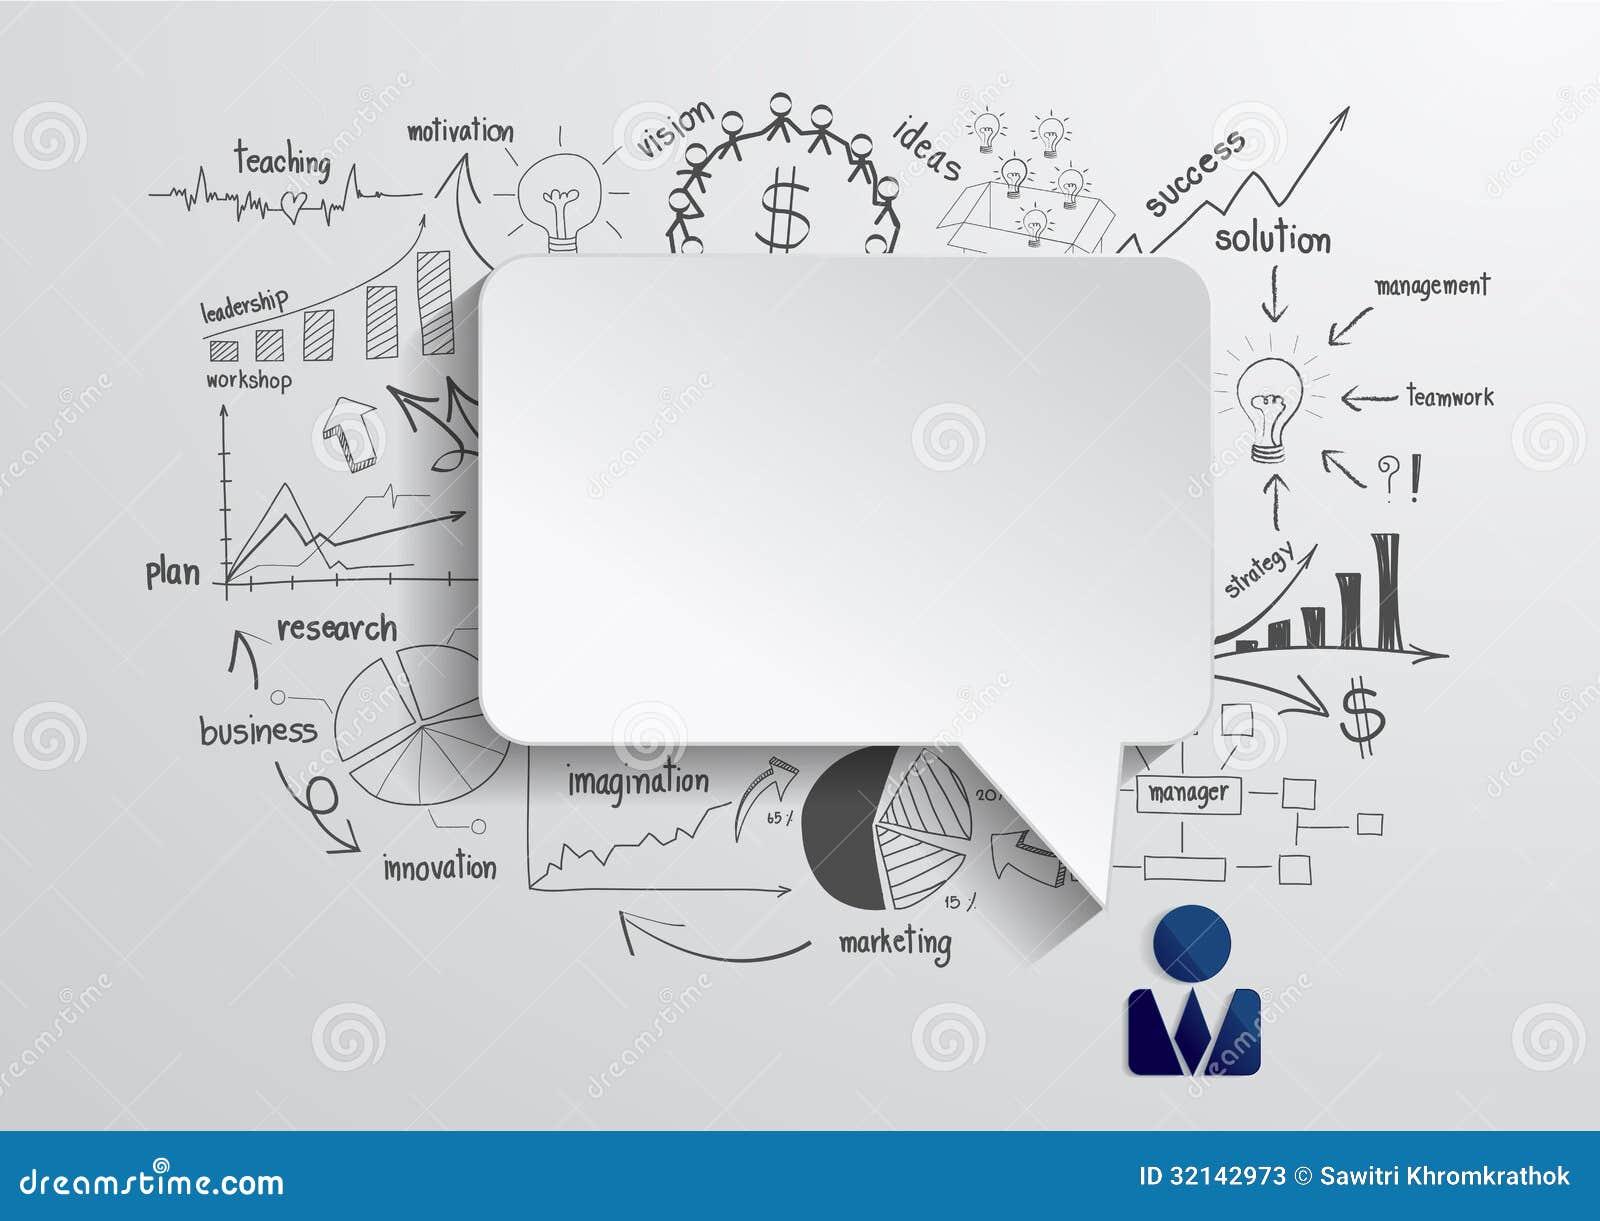 108 idea business plan